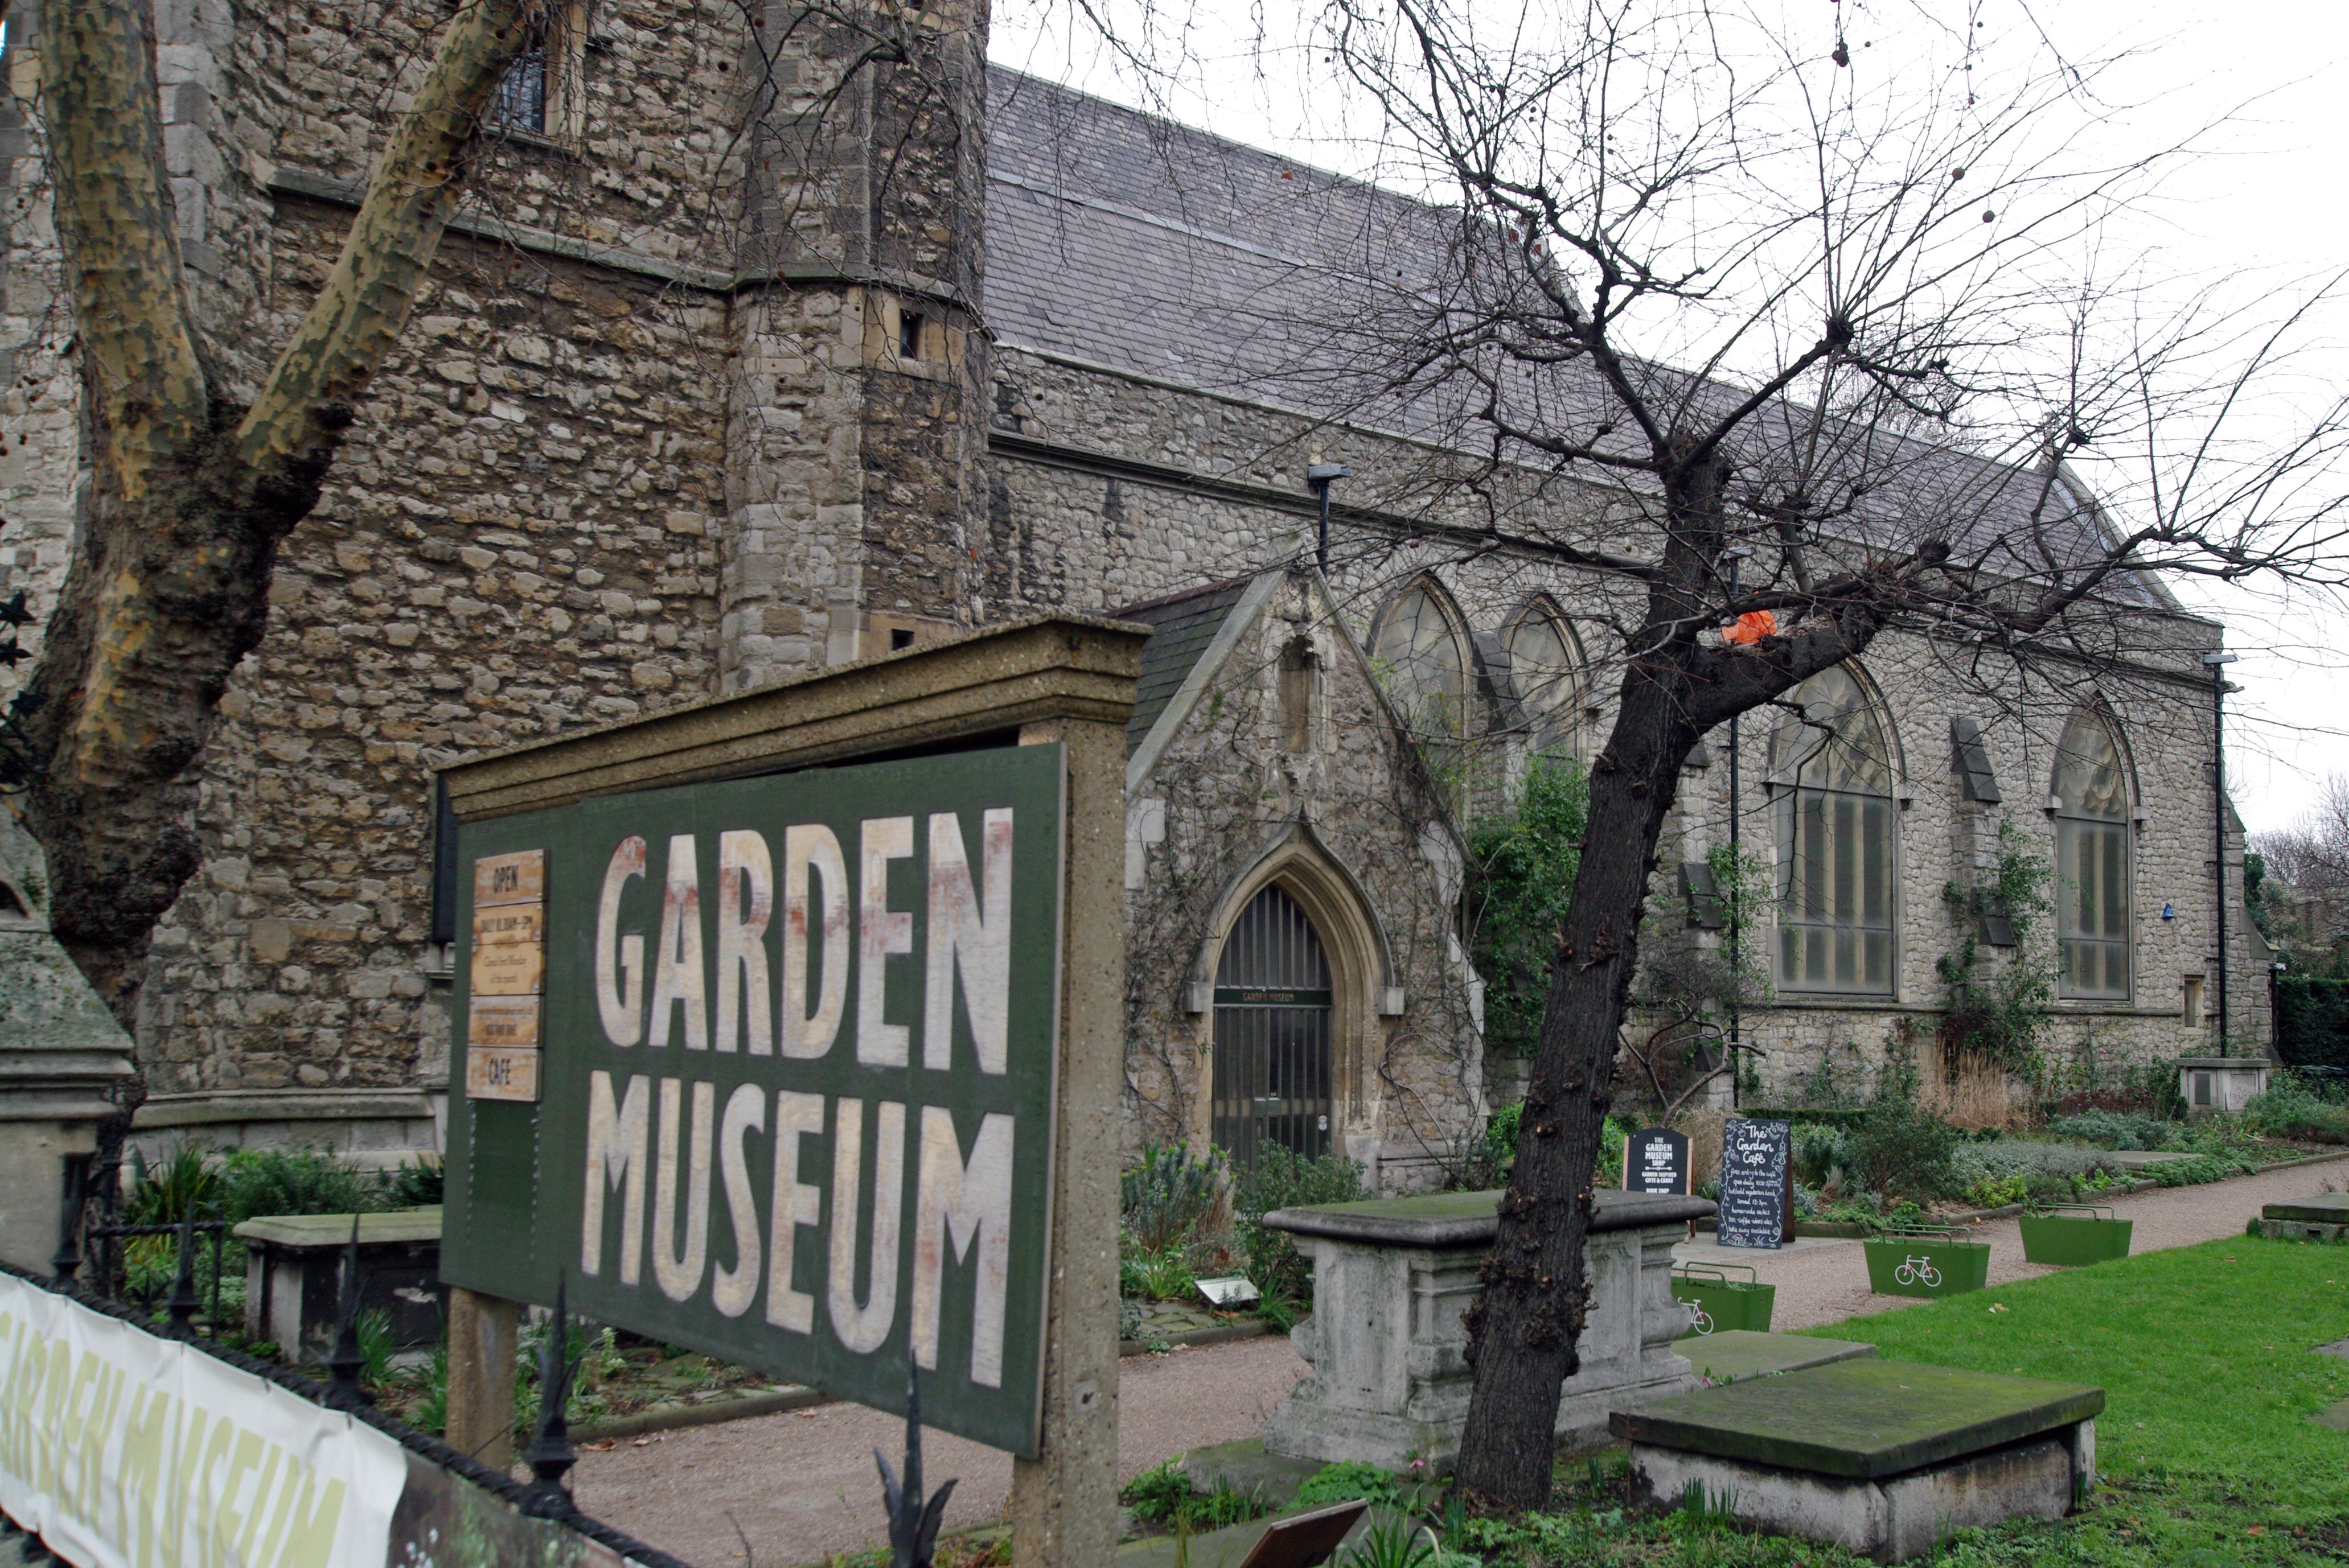 London garden museum entrance.JPG